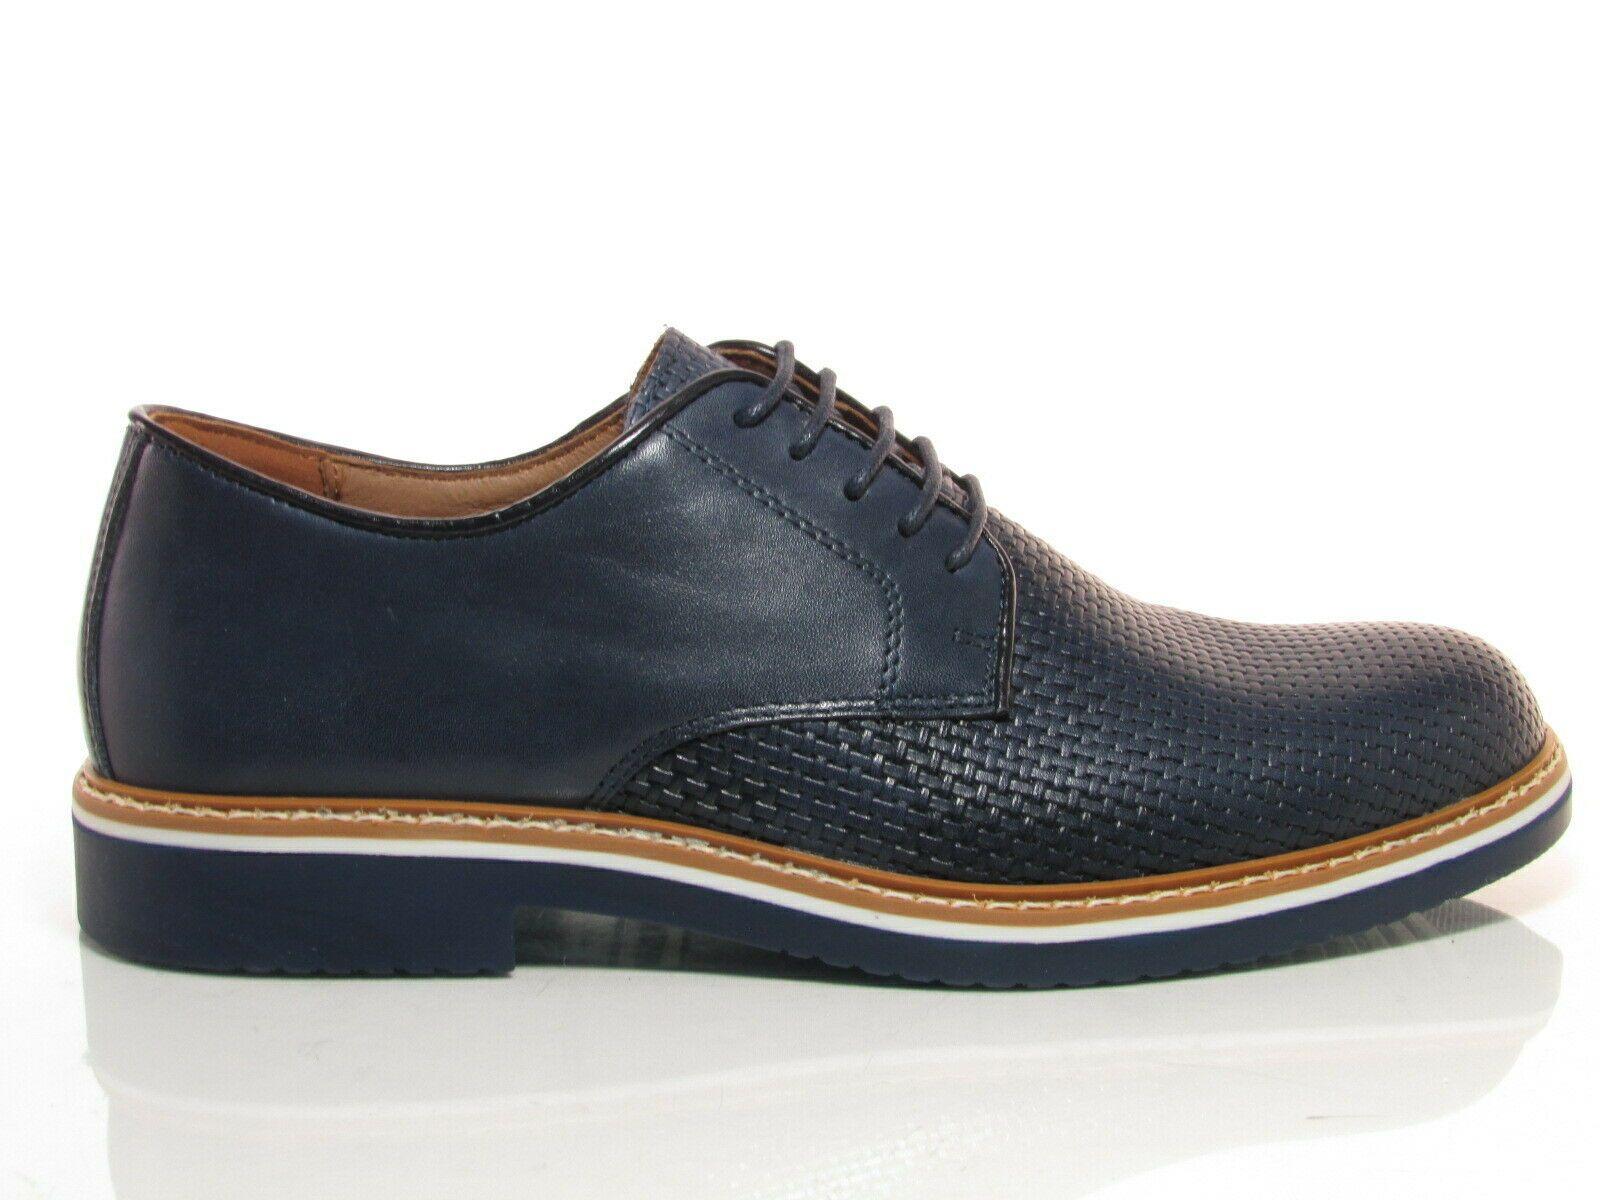 Imac 300620 scarpe uomo casual eleganti francesina pelle blu